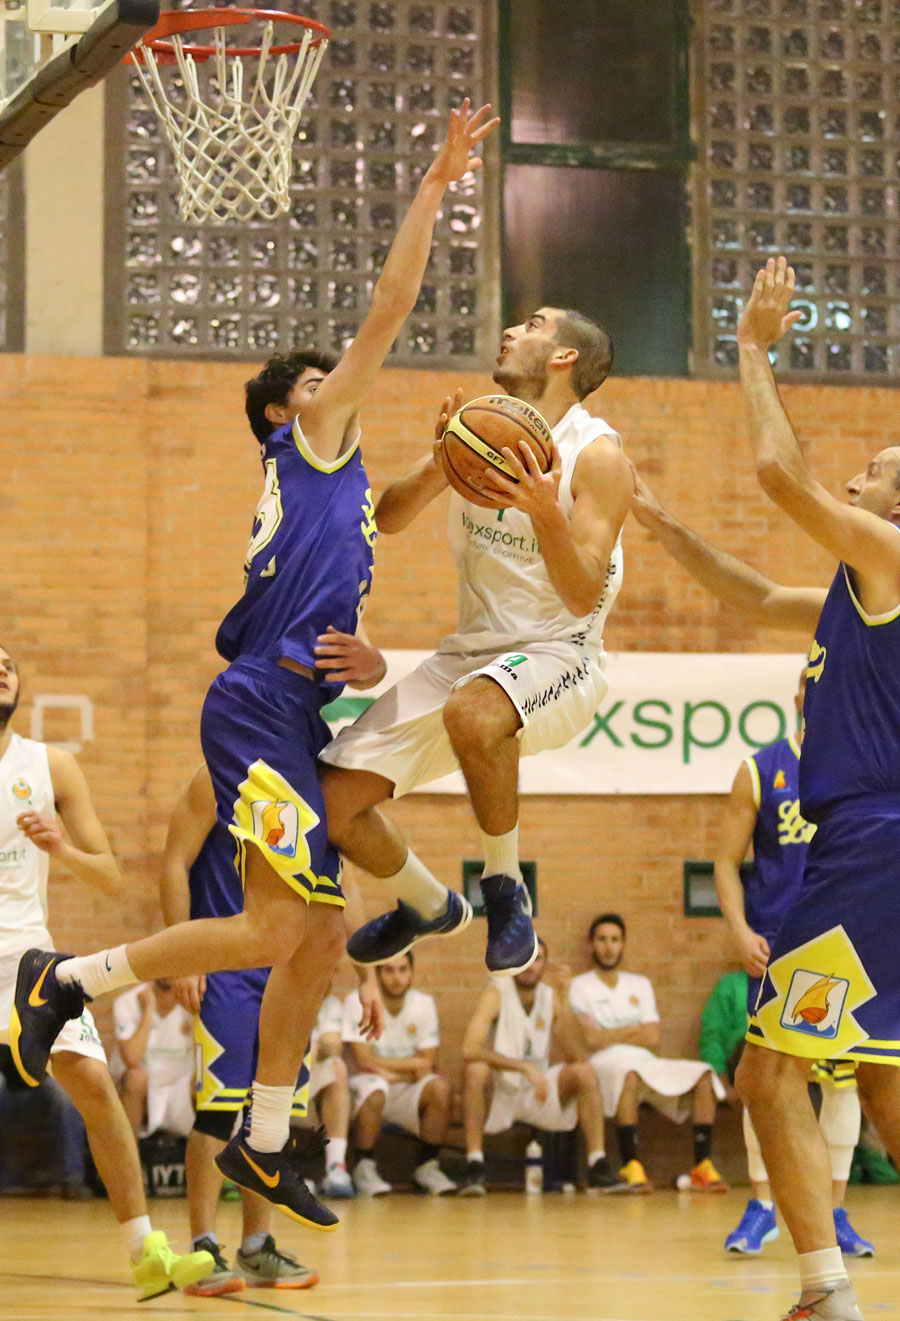 03niccolo_bandinelli_valdisieve_libertas_livorno_basket2015